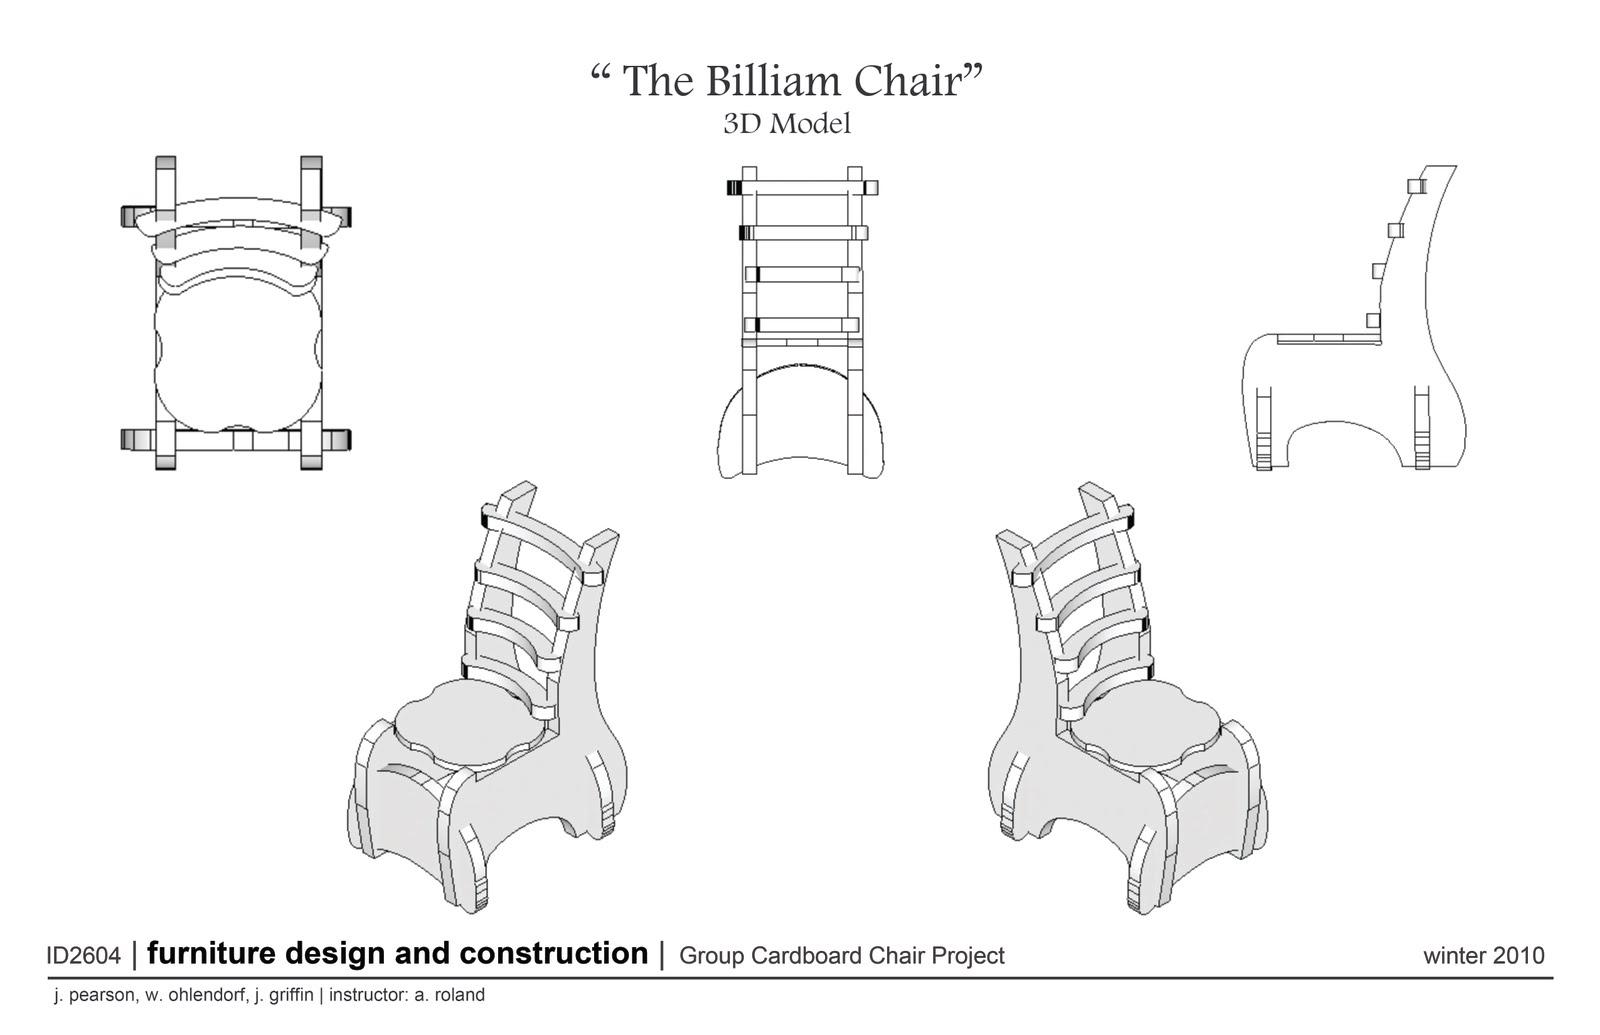 chair design portfolio covers event jacquelyn pearson 39s award winning